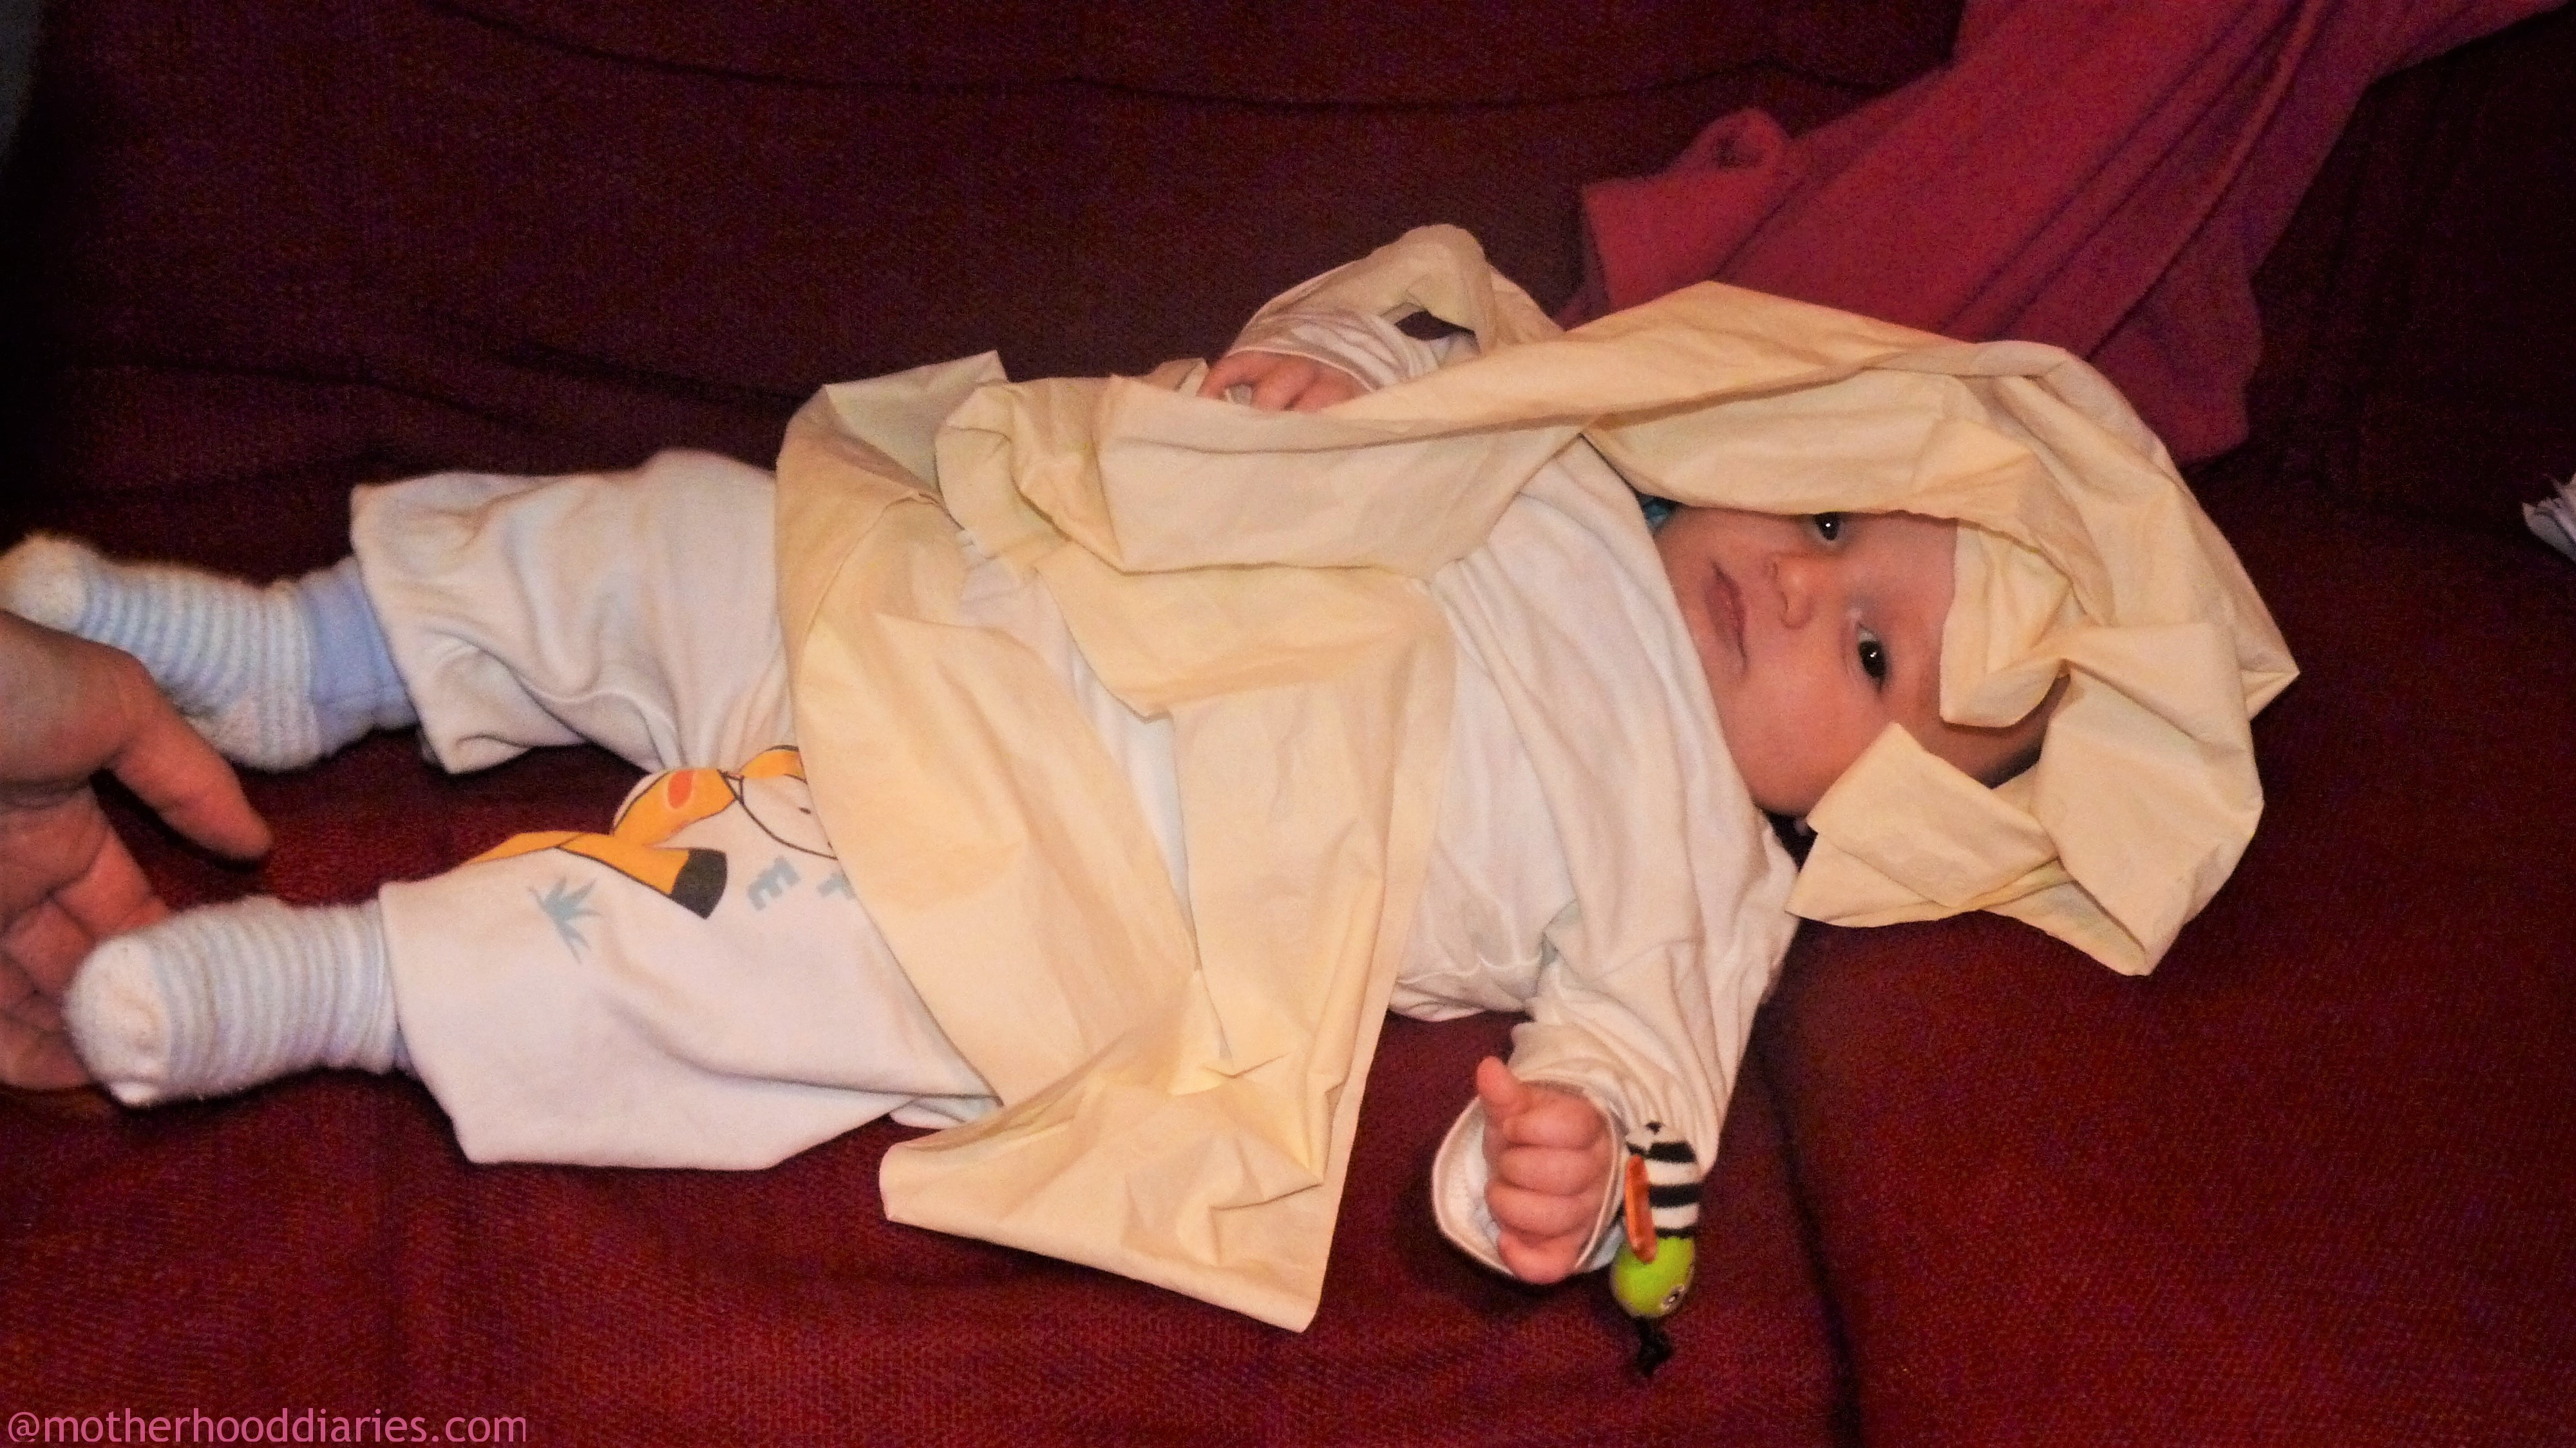 16 weeks old - I need to get some sleep!